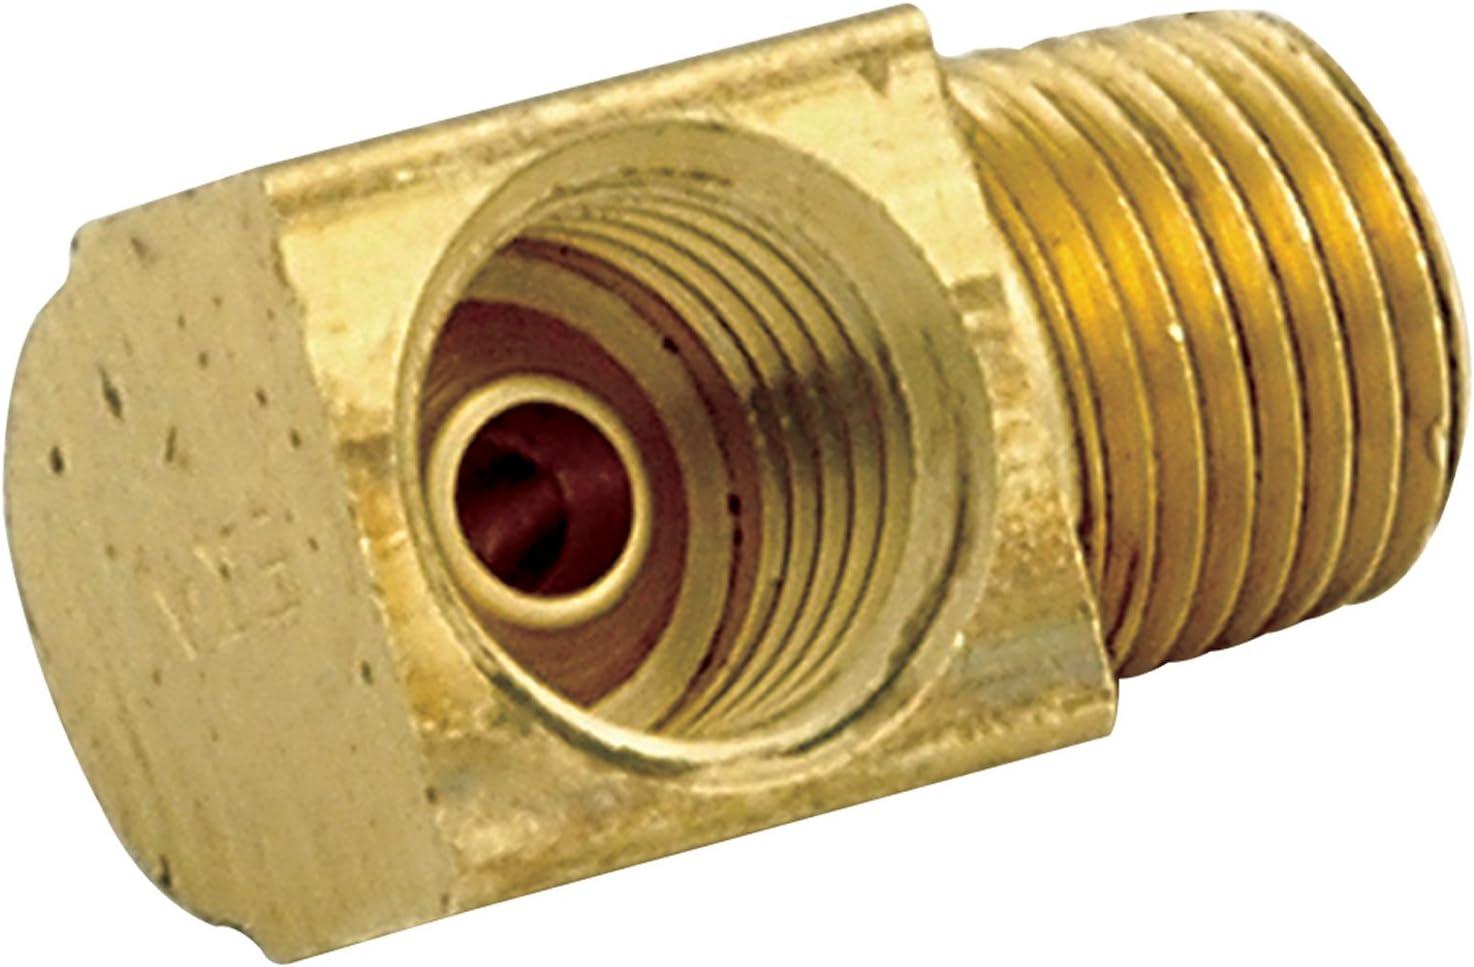 Allstar Performance ALL50125 1//8 NPT 3//8-24 90 Degree Adapter Fitting 4 Pack